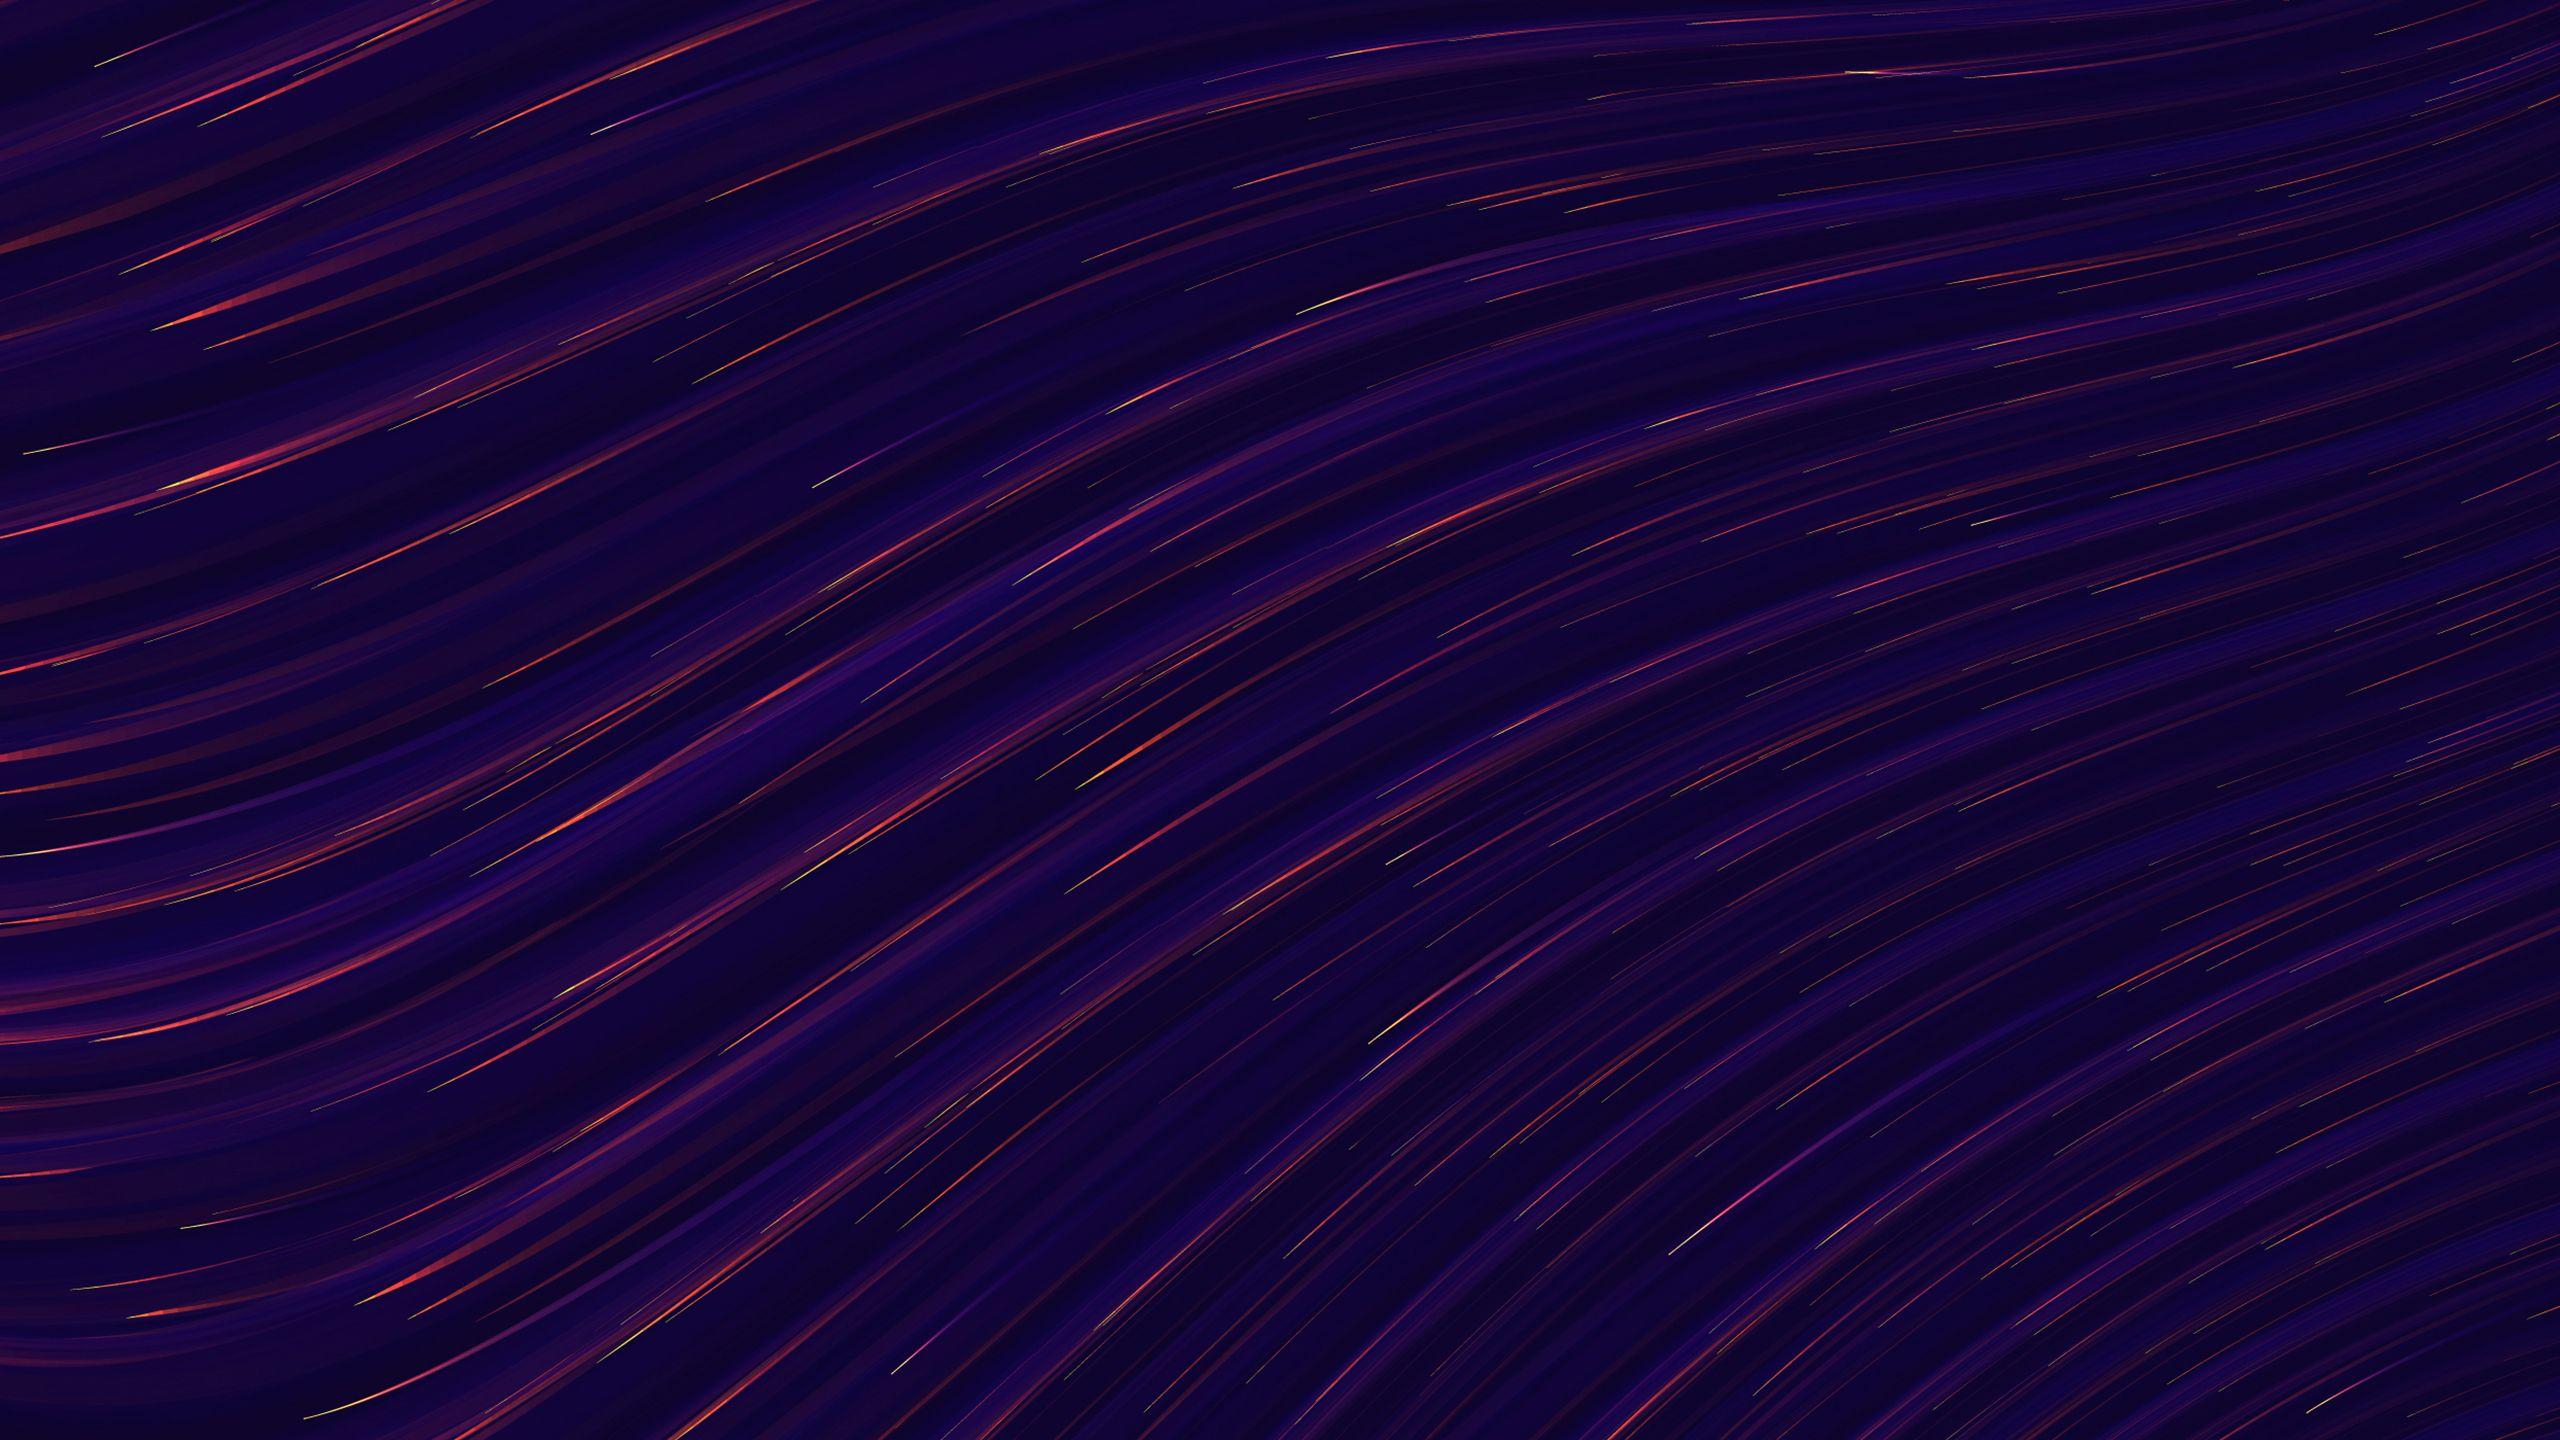 Downaload Cobalt Blue Waves Dark Digital Art Wallpaper For Screen 2560x1440 Dual Wide Widescreen 169